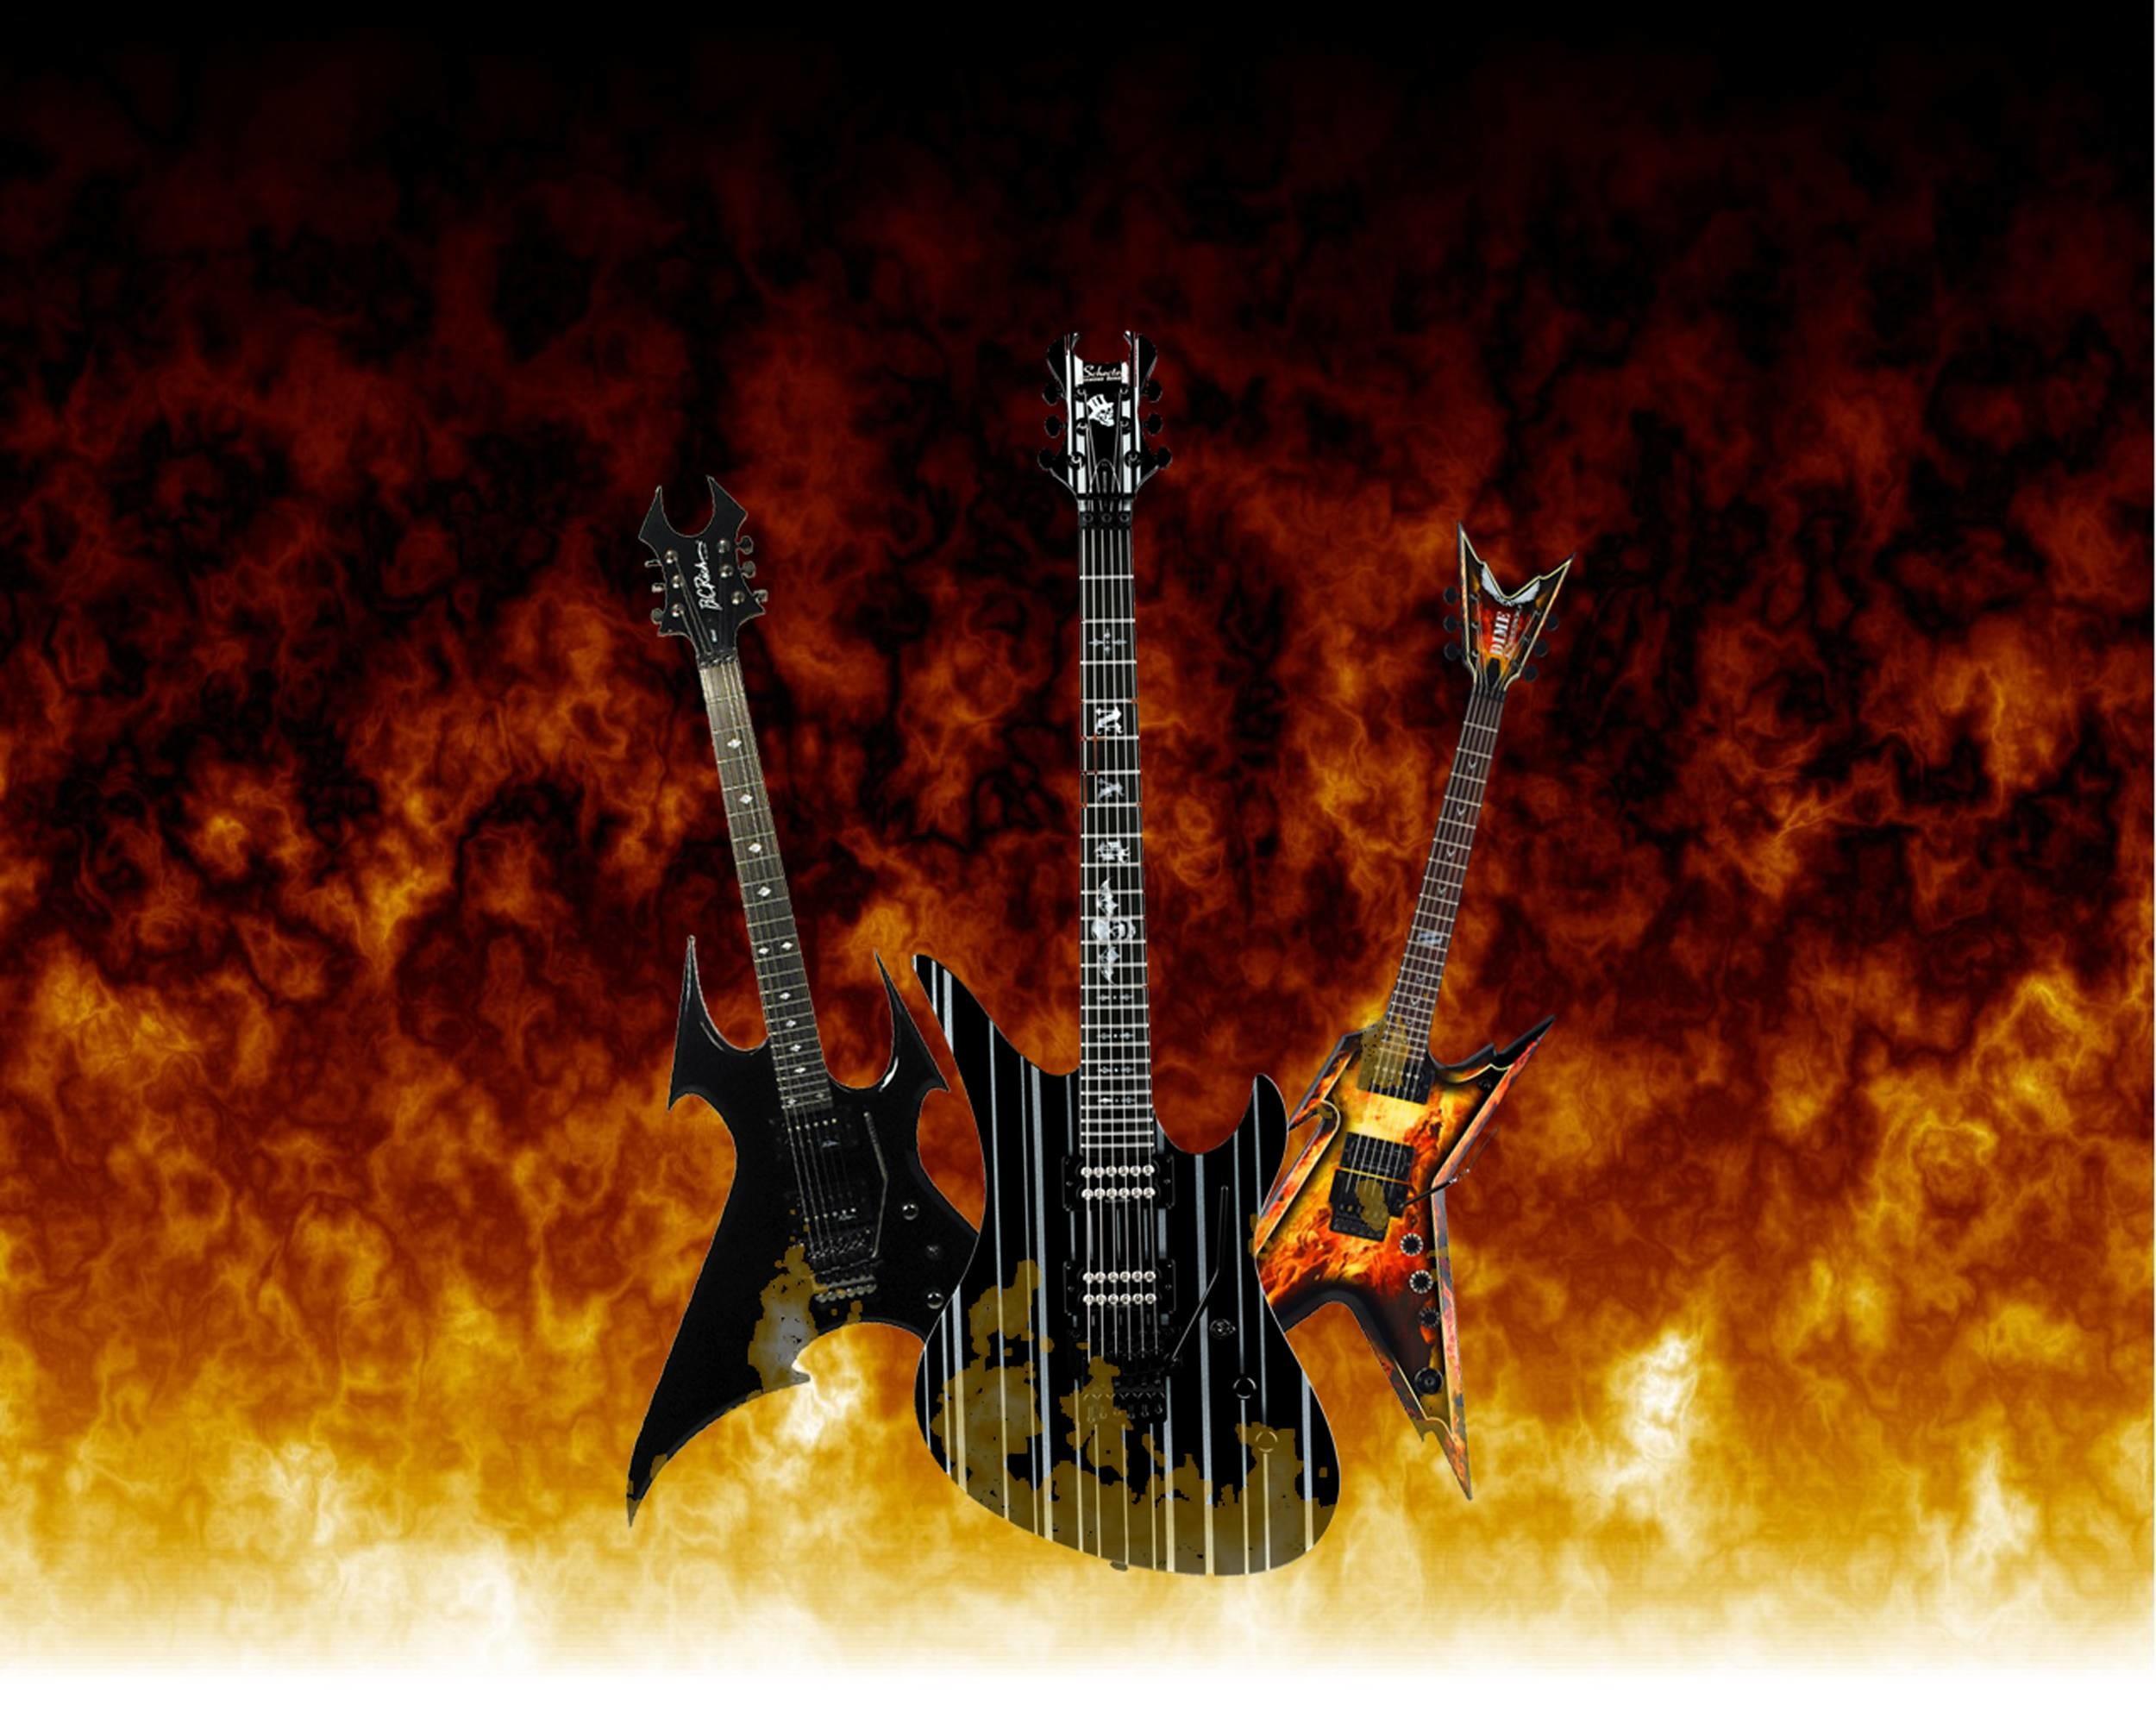 2816x2112 Images For Bass Guitar Wallpaper